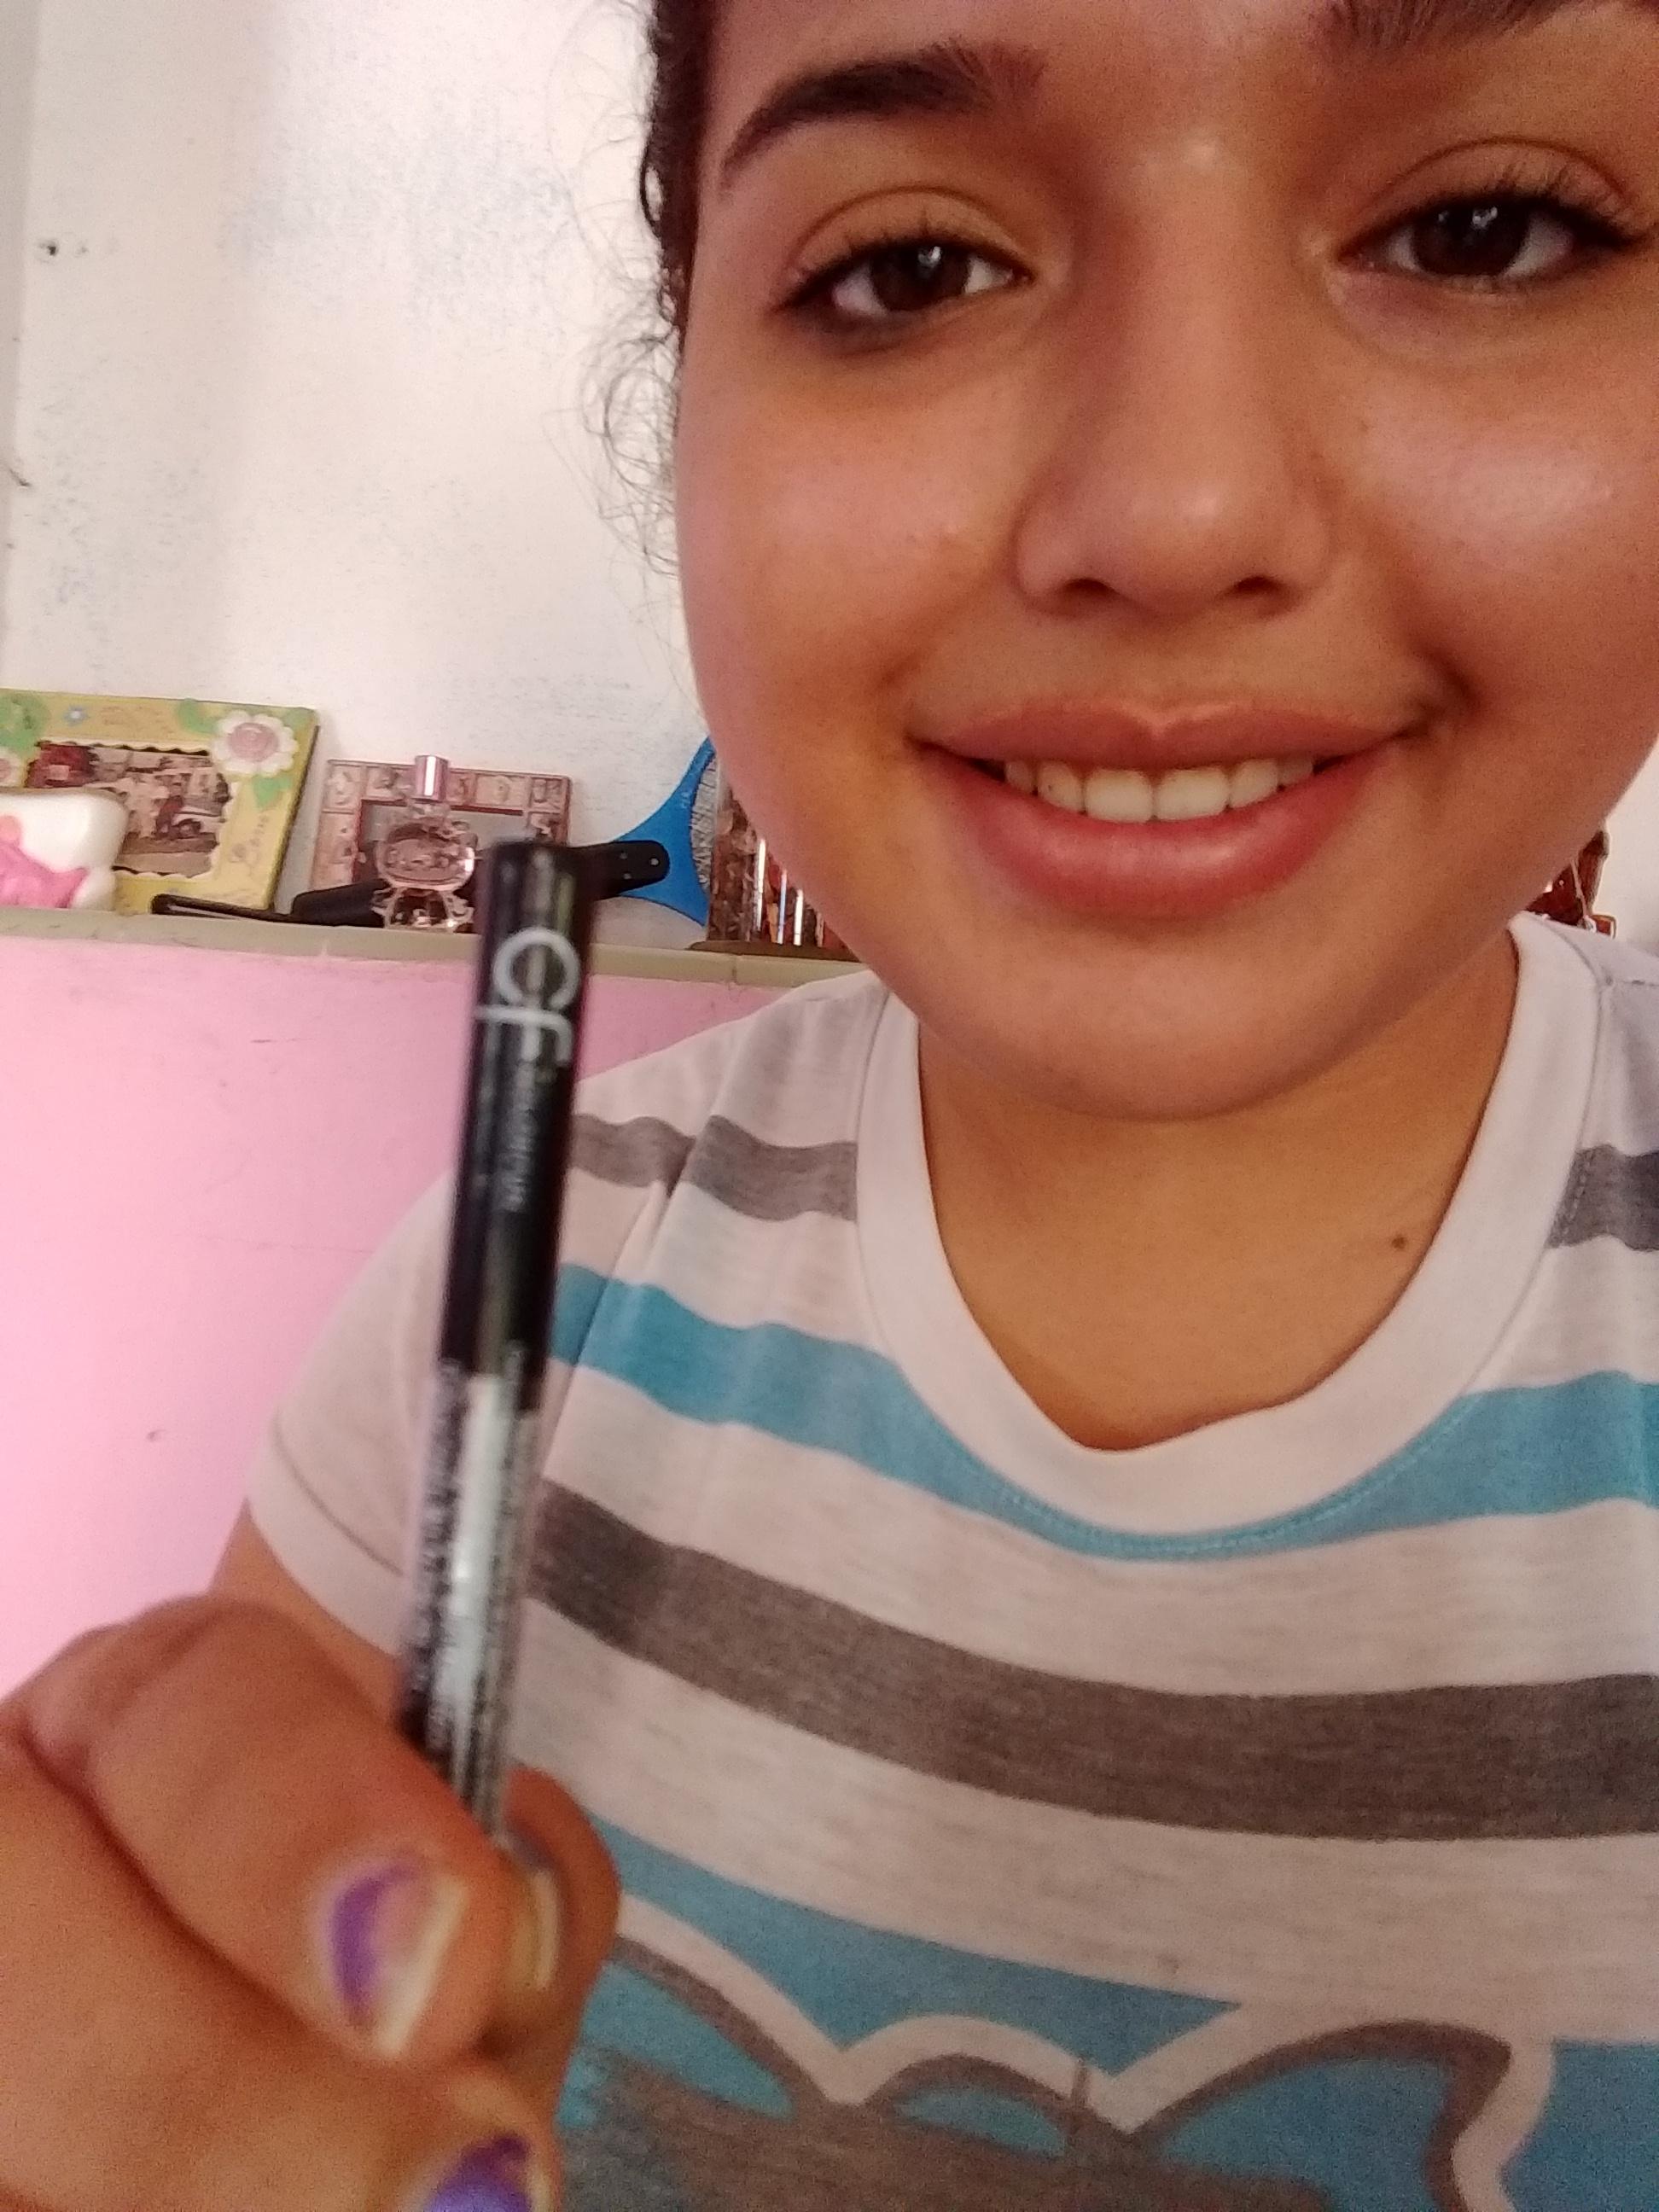 Tanya Abigail Gonzalez Escalante